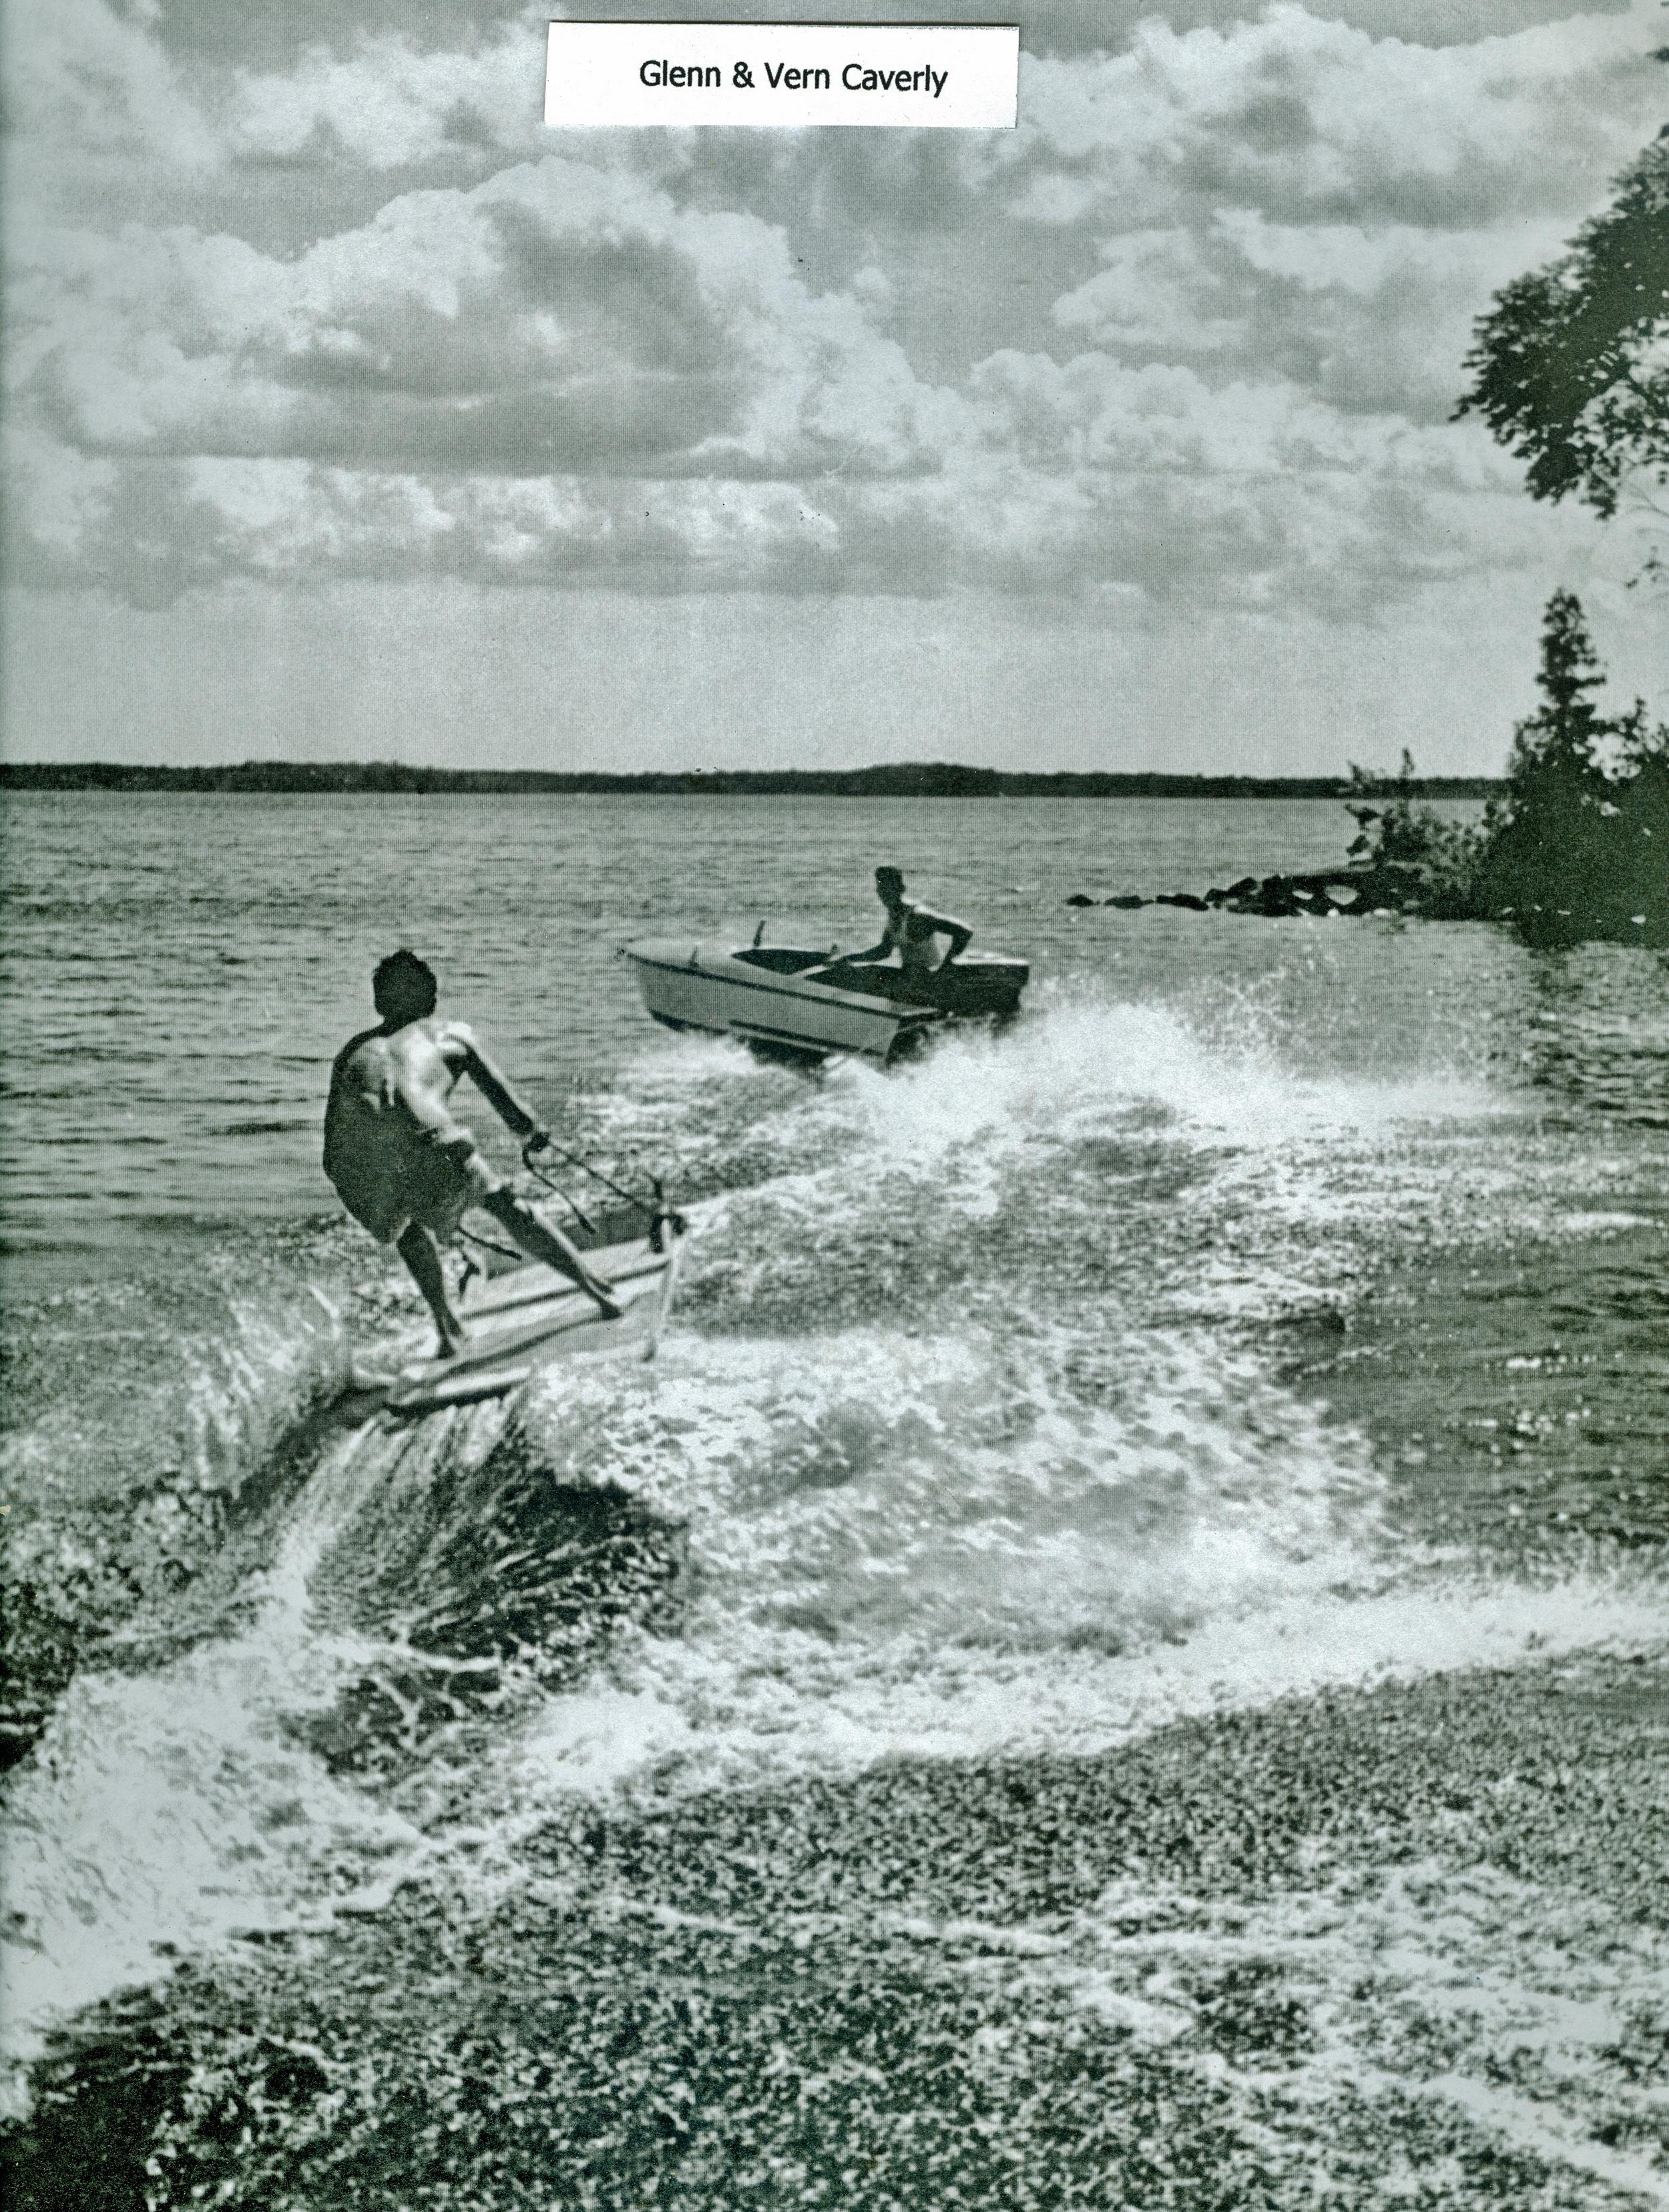 Vern Caverly & Glenn Caverly,  Crowe Lake,  Marmora.jpg